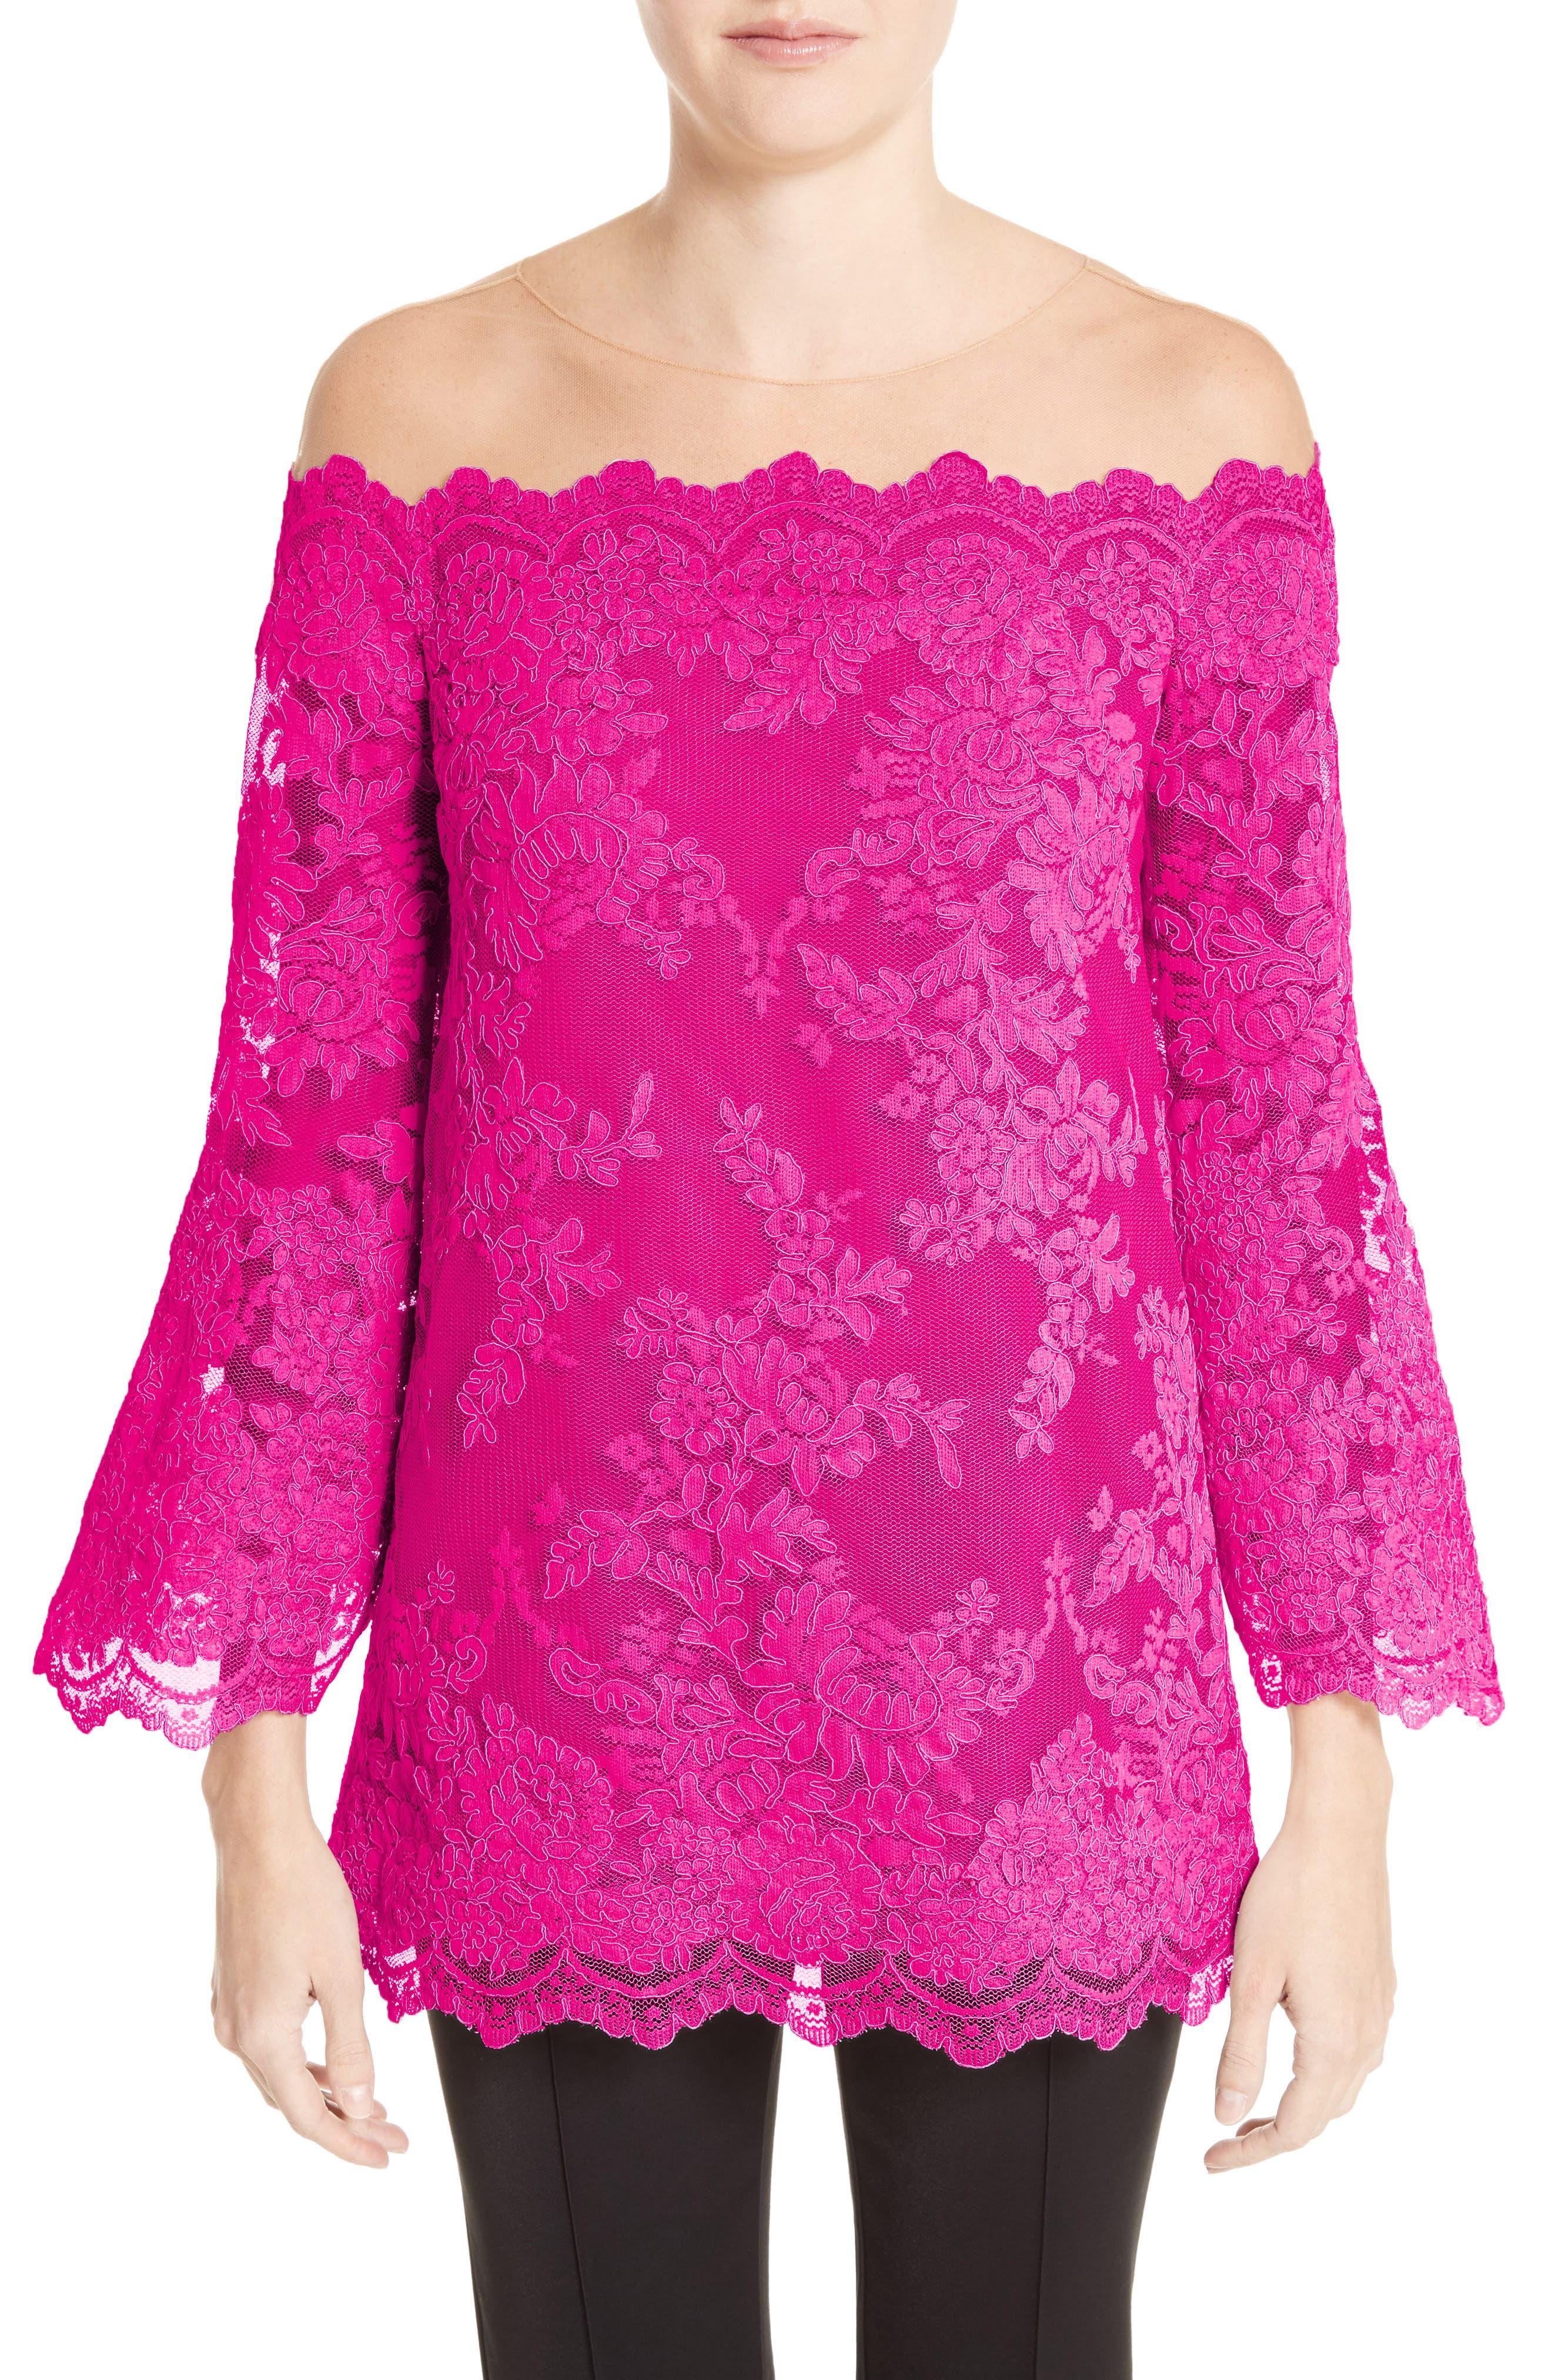 Off The Shoulder Illusion Lace Top,                         Main,                         color, Fuchsia